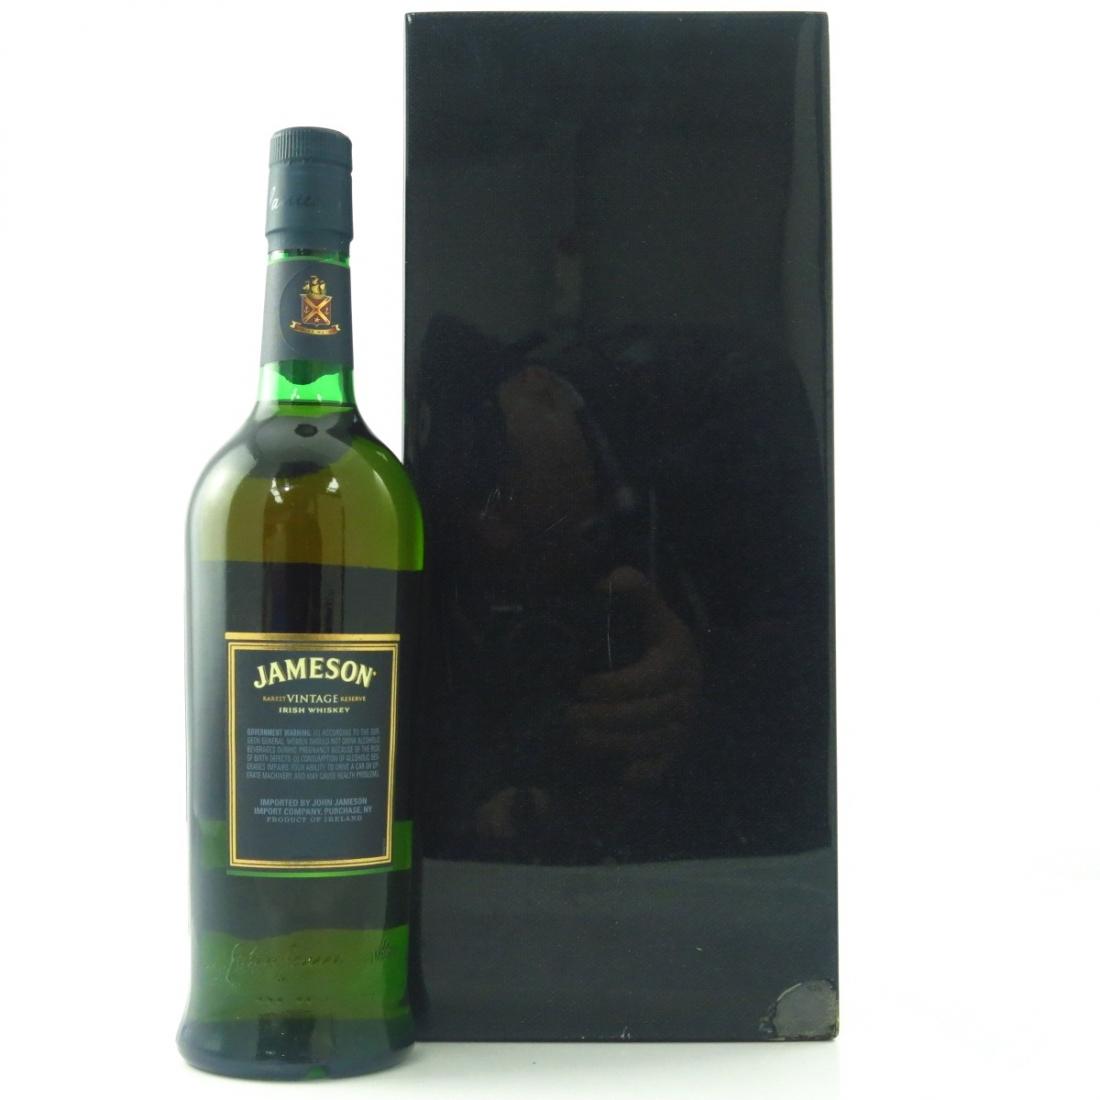 Jameson 2009 Rarest Vintage Reserve 75cl / US Import